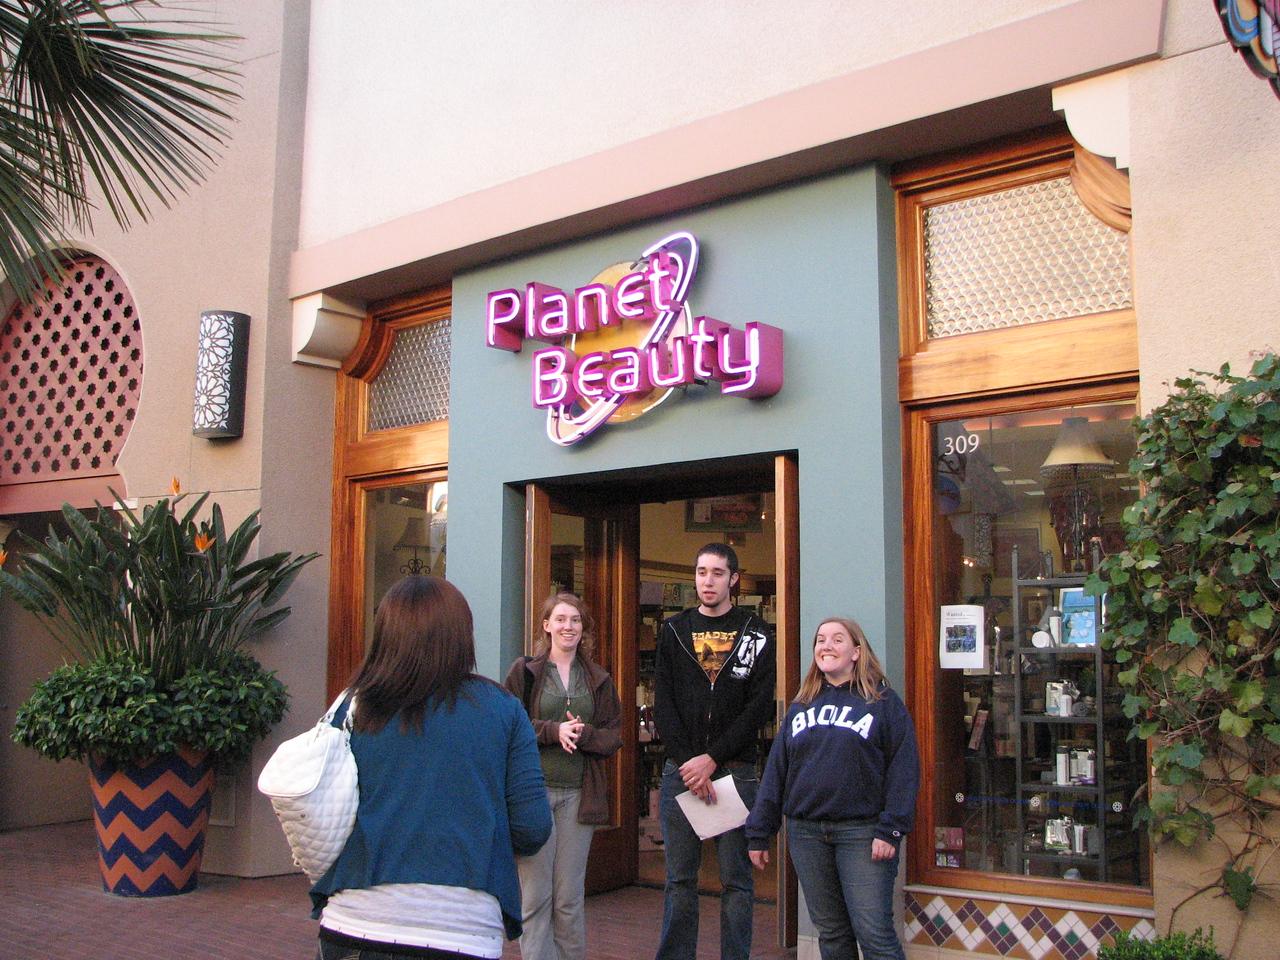 2007 03 02 Fri - Scavenger Hunt - Planet Beauty